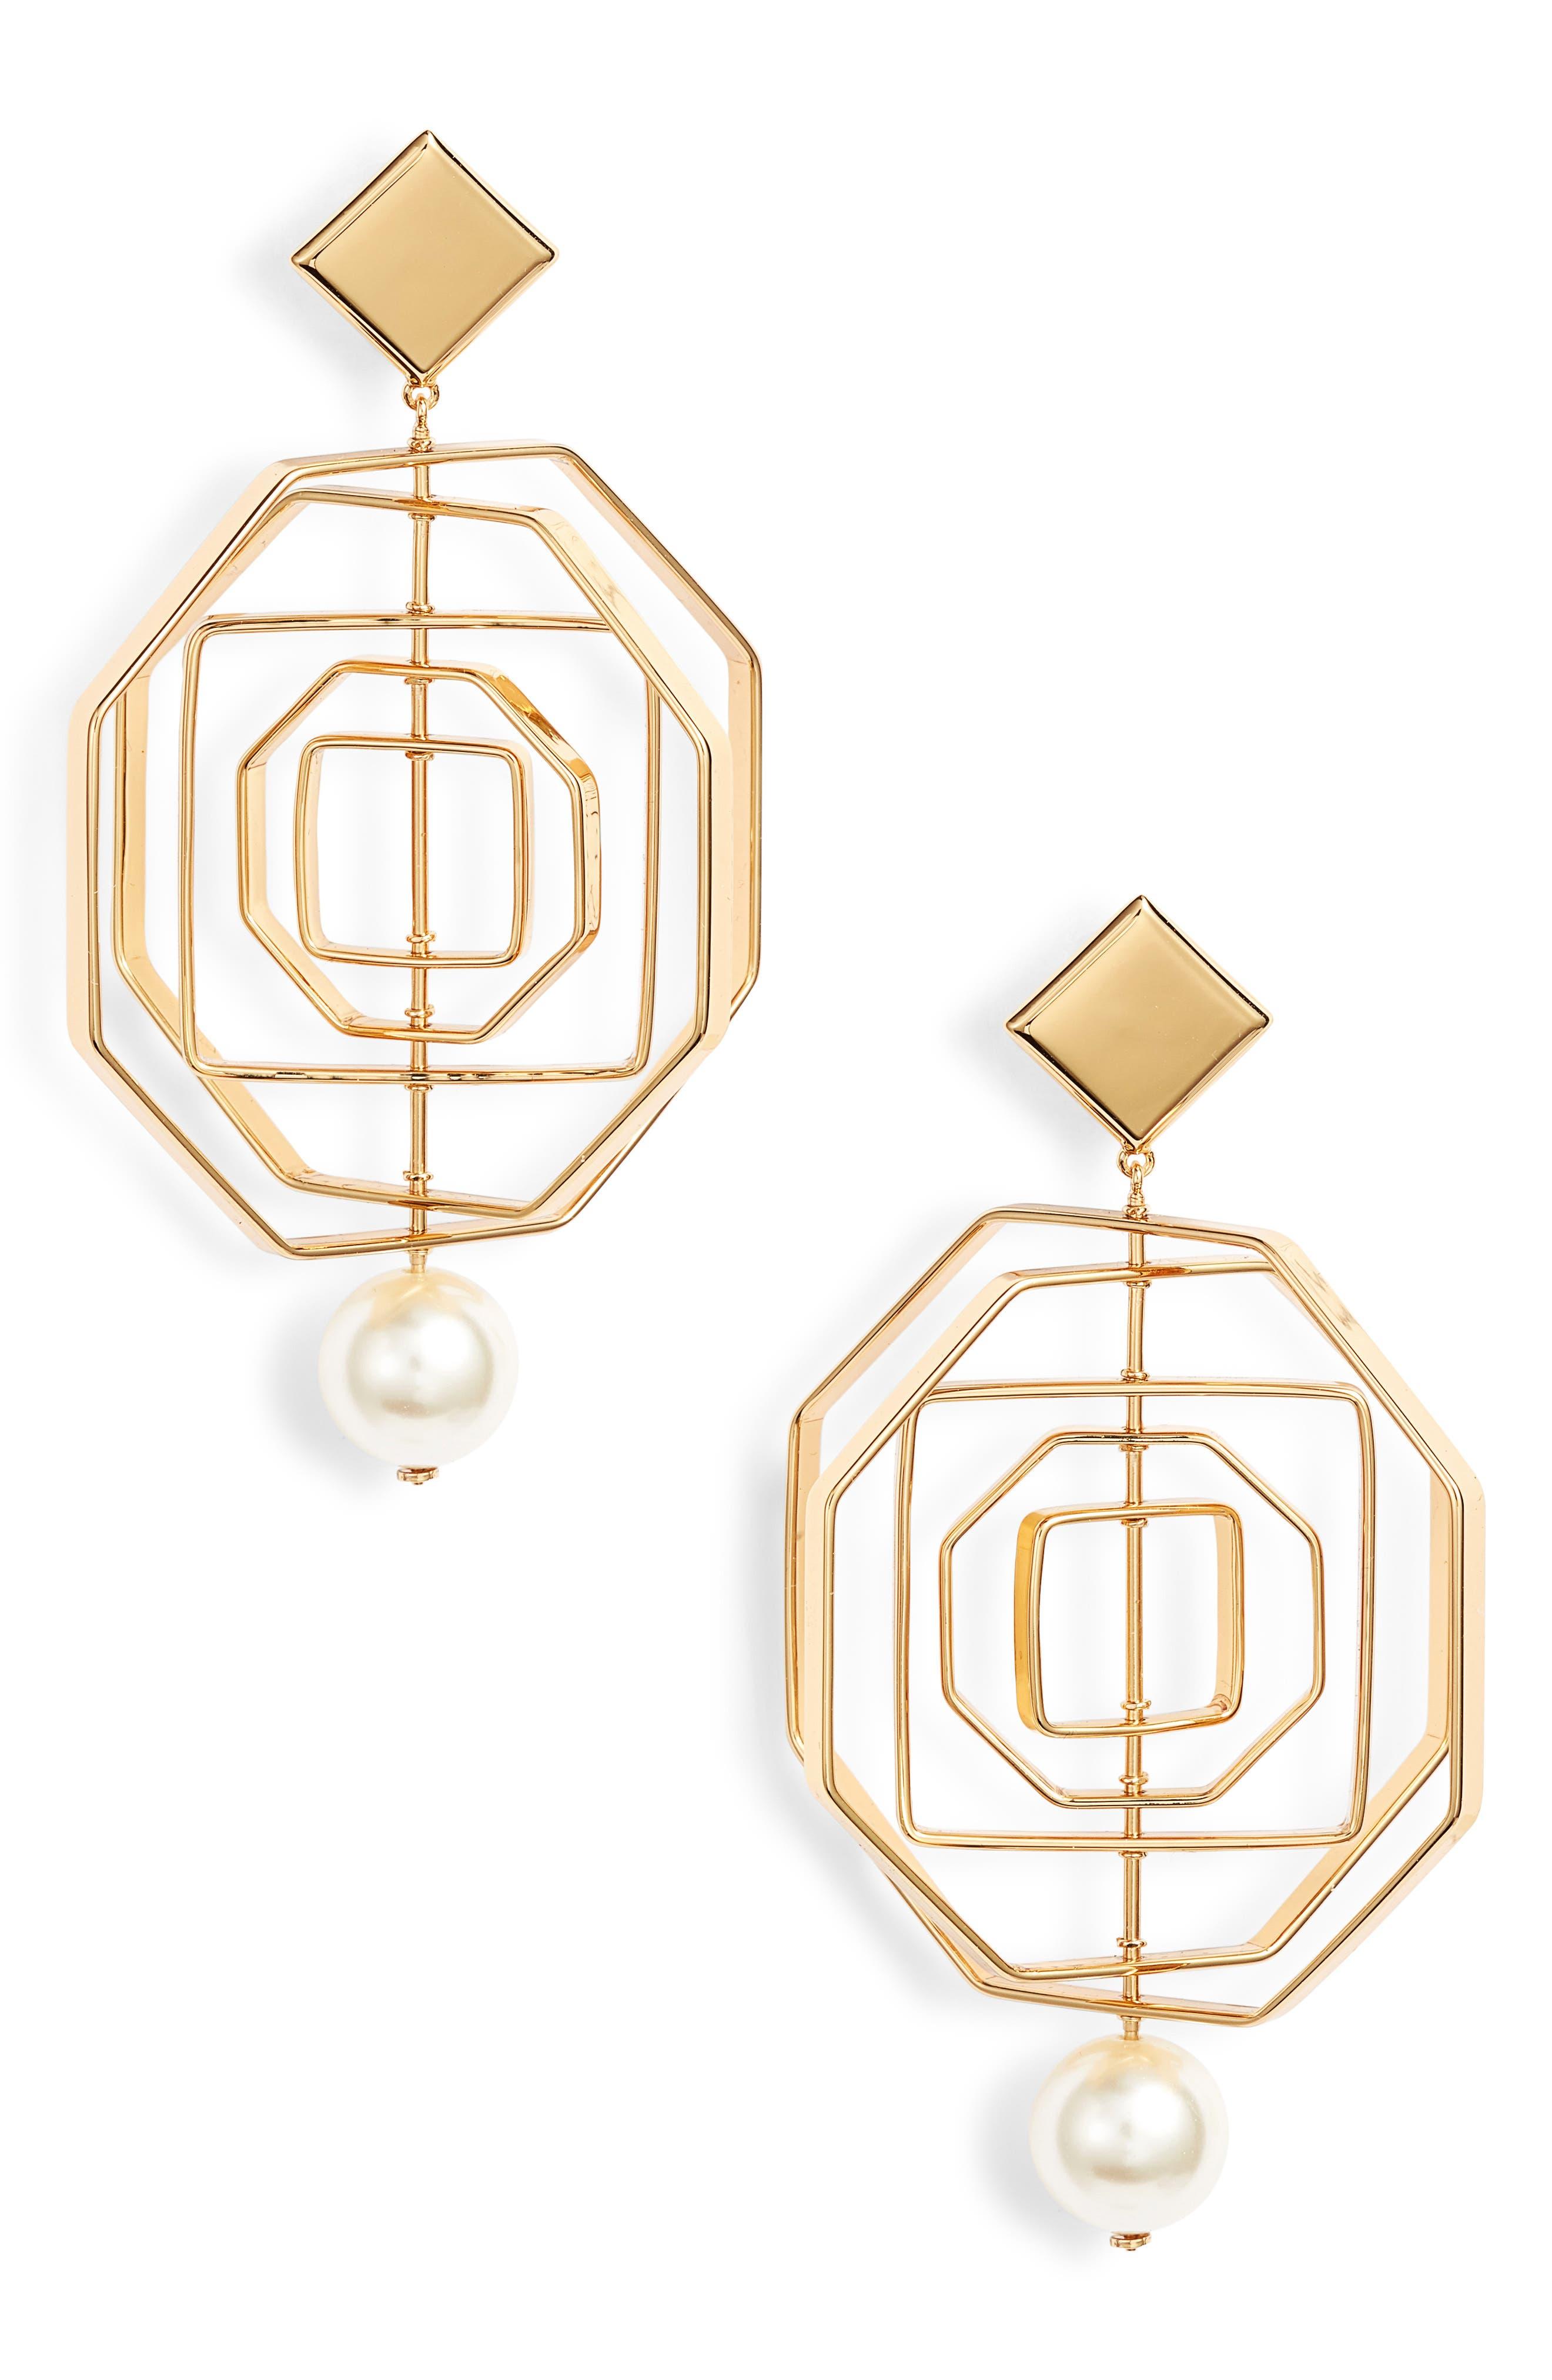 Geo Imitation Pearl Statement Earrings,                             Main thumbnail 1, color,                             710